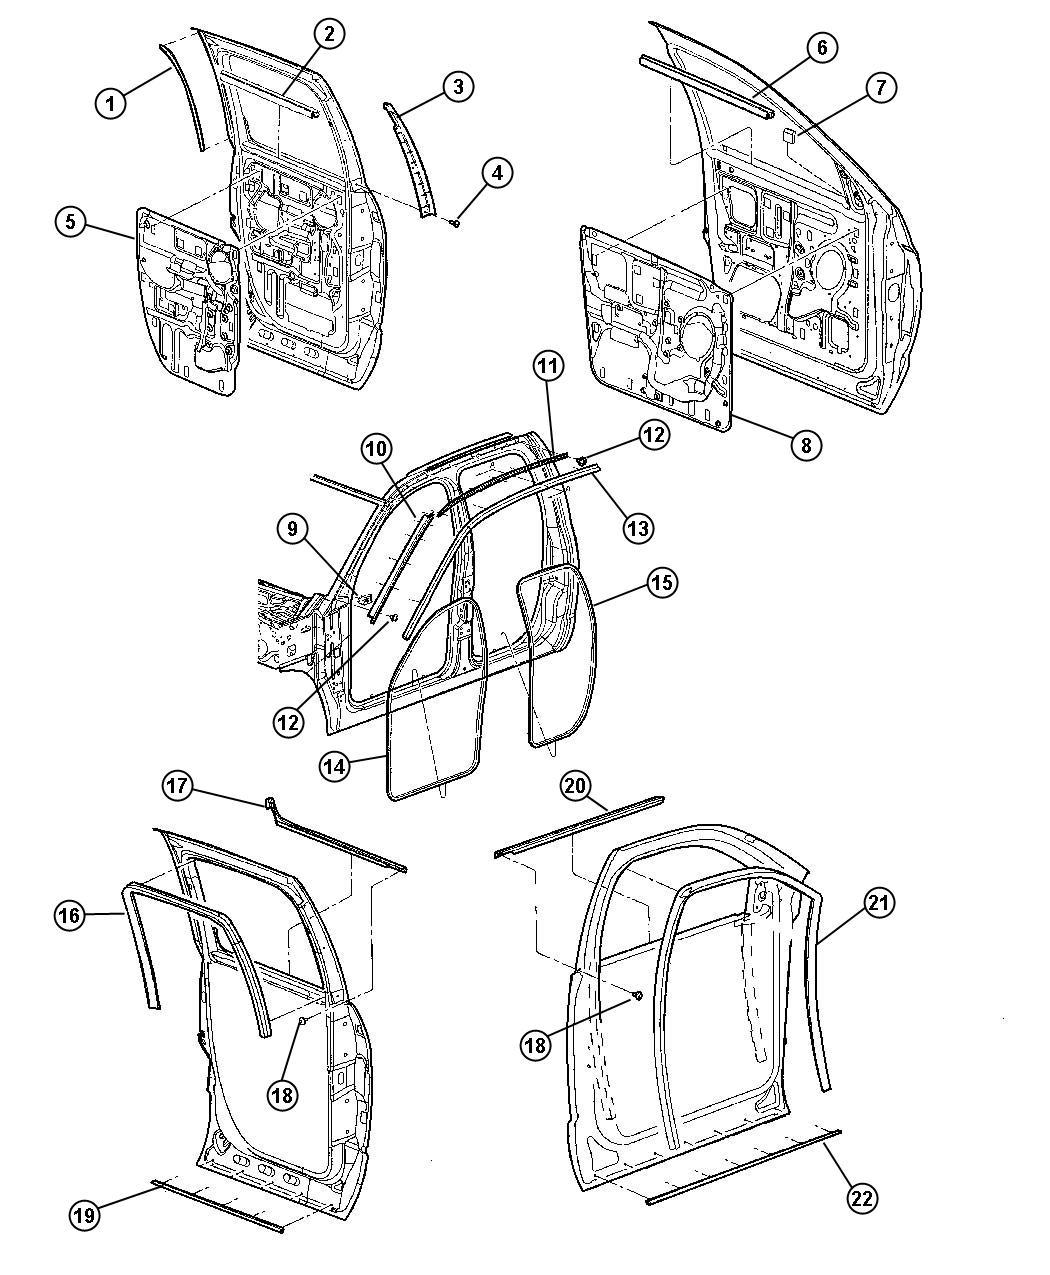 Dodge Ram Slt Quad Cab 5 7l V8 A T 4x4 Seal